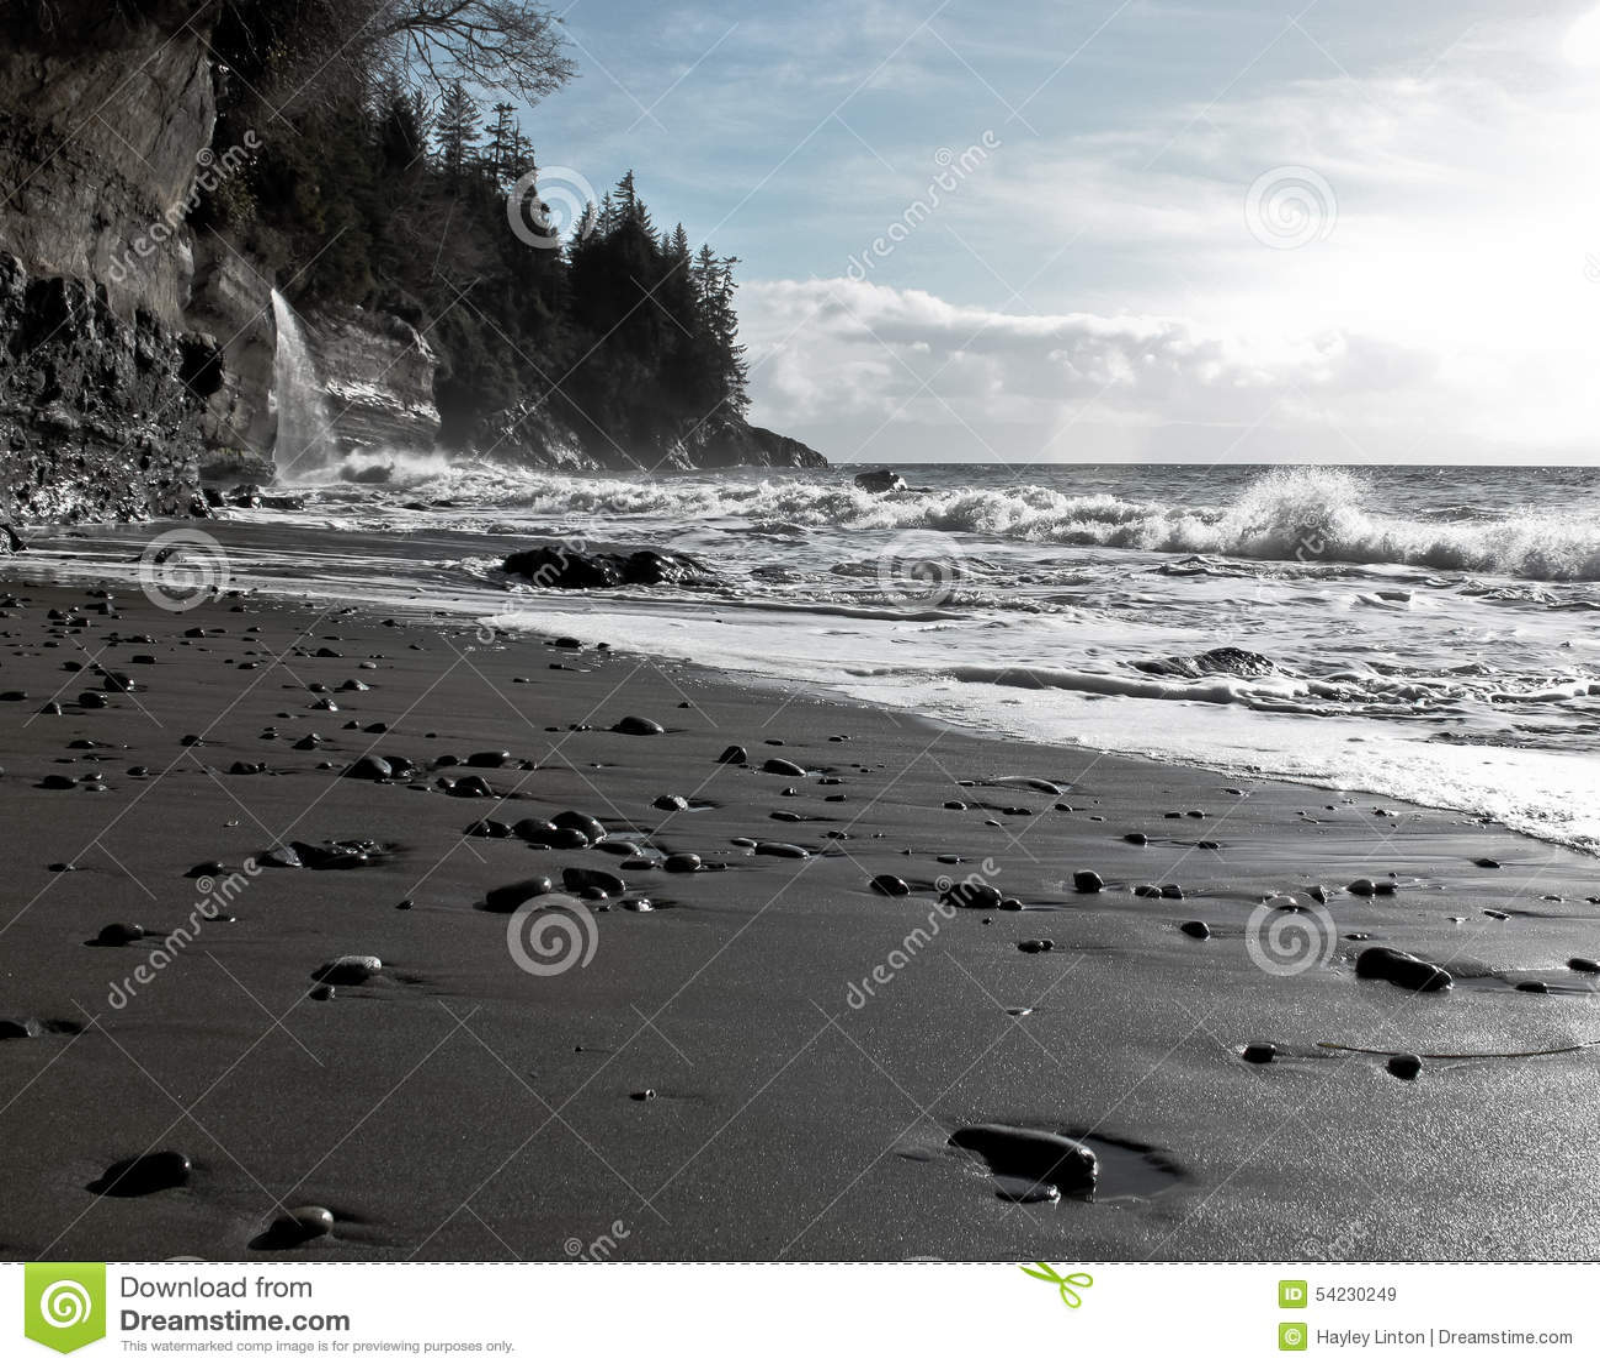 Beaches Vancouver Island: Mystic Beach, Vancouver Island, BC, Canada Stock Photo